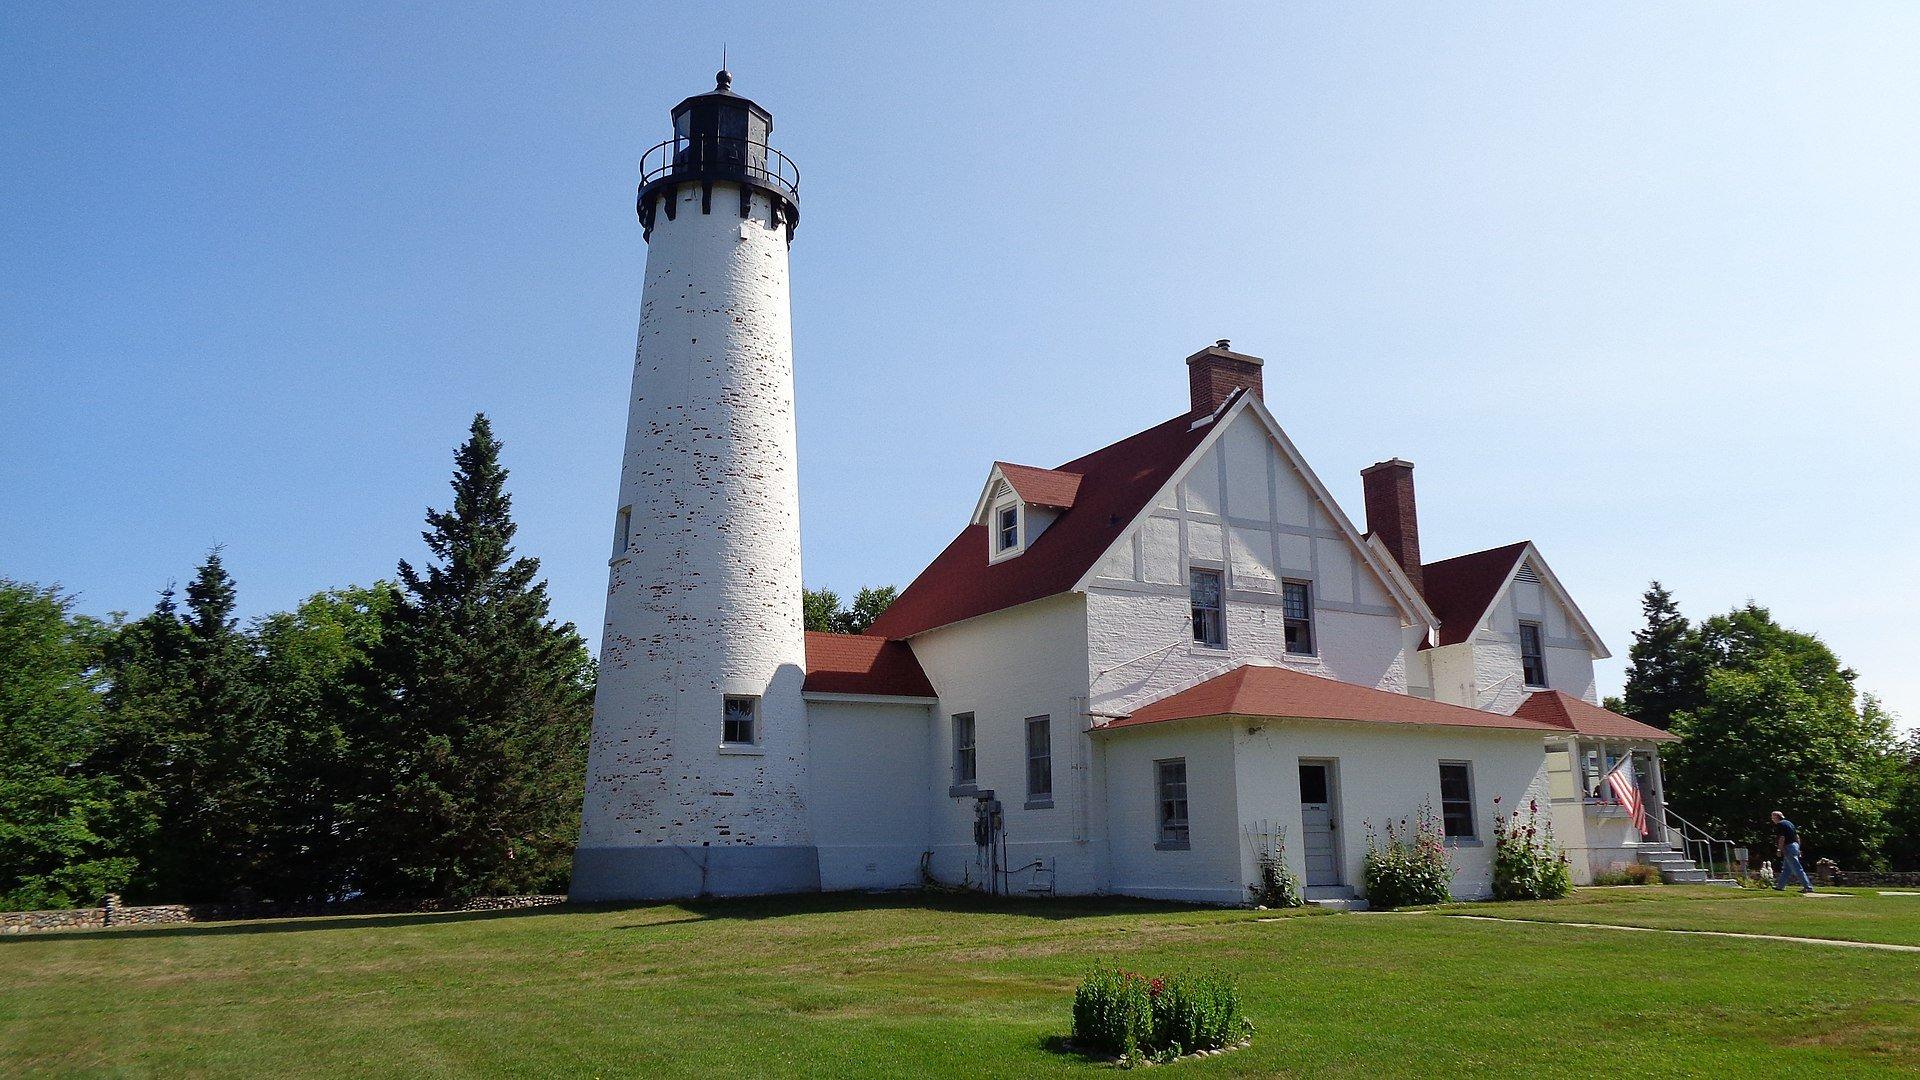 Point Iroquois Lighthouse, Brimley, Michigan (Photo Credit: Wikipedia)